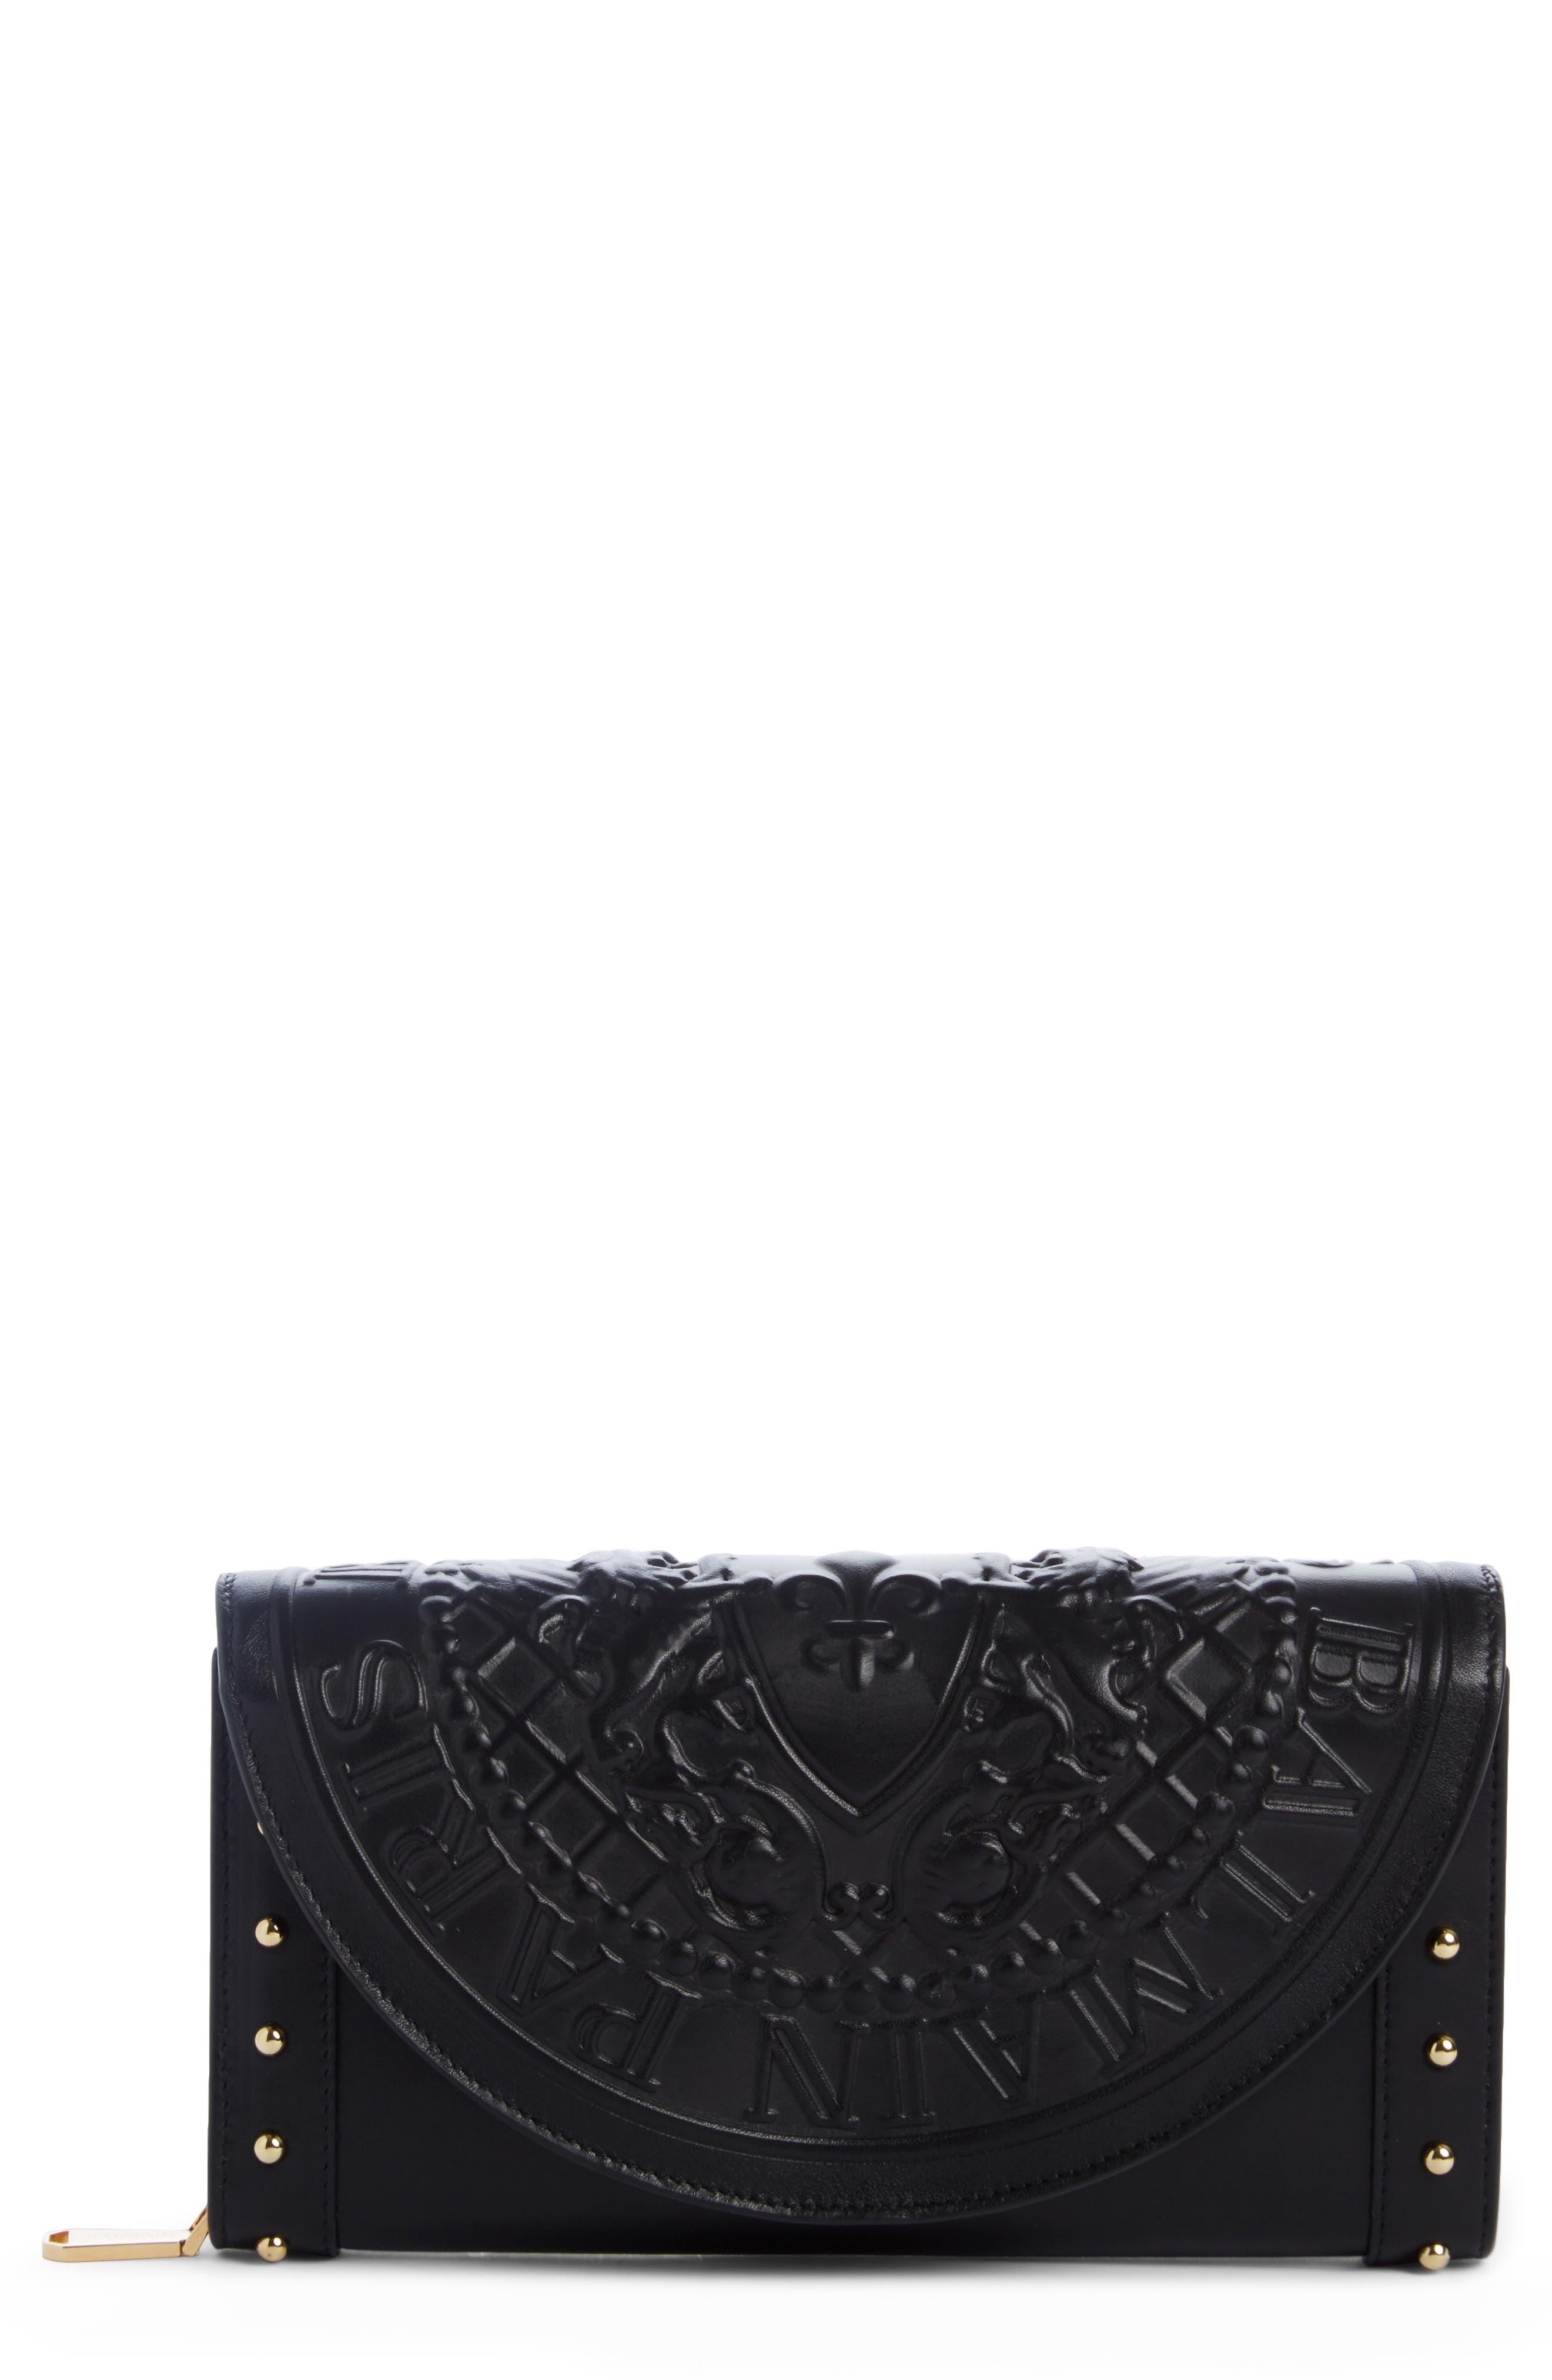 Balmain Renaissance Leather Wallet on a Chain